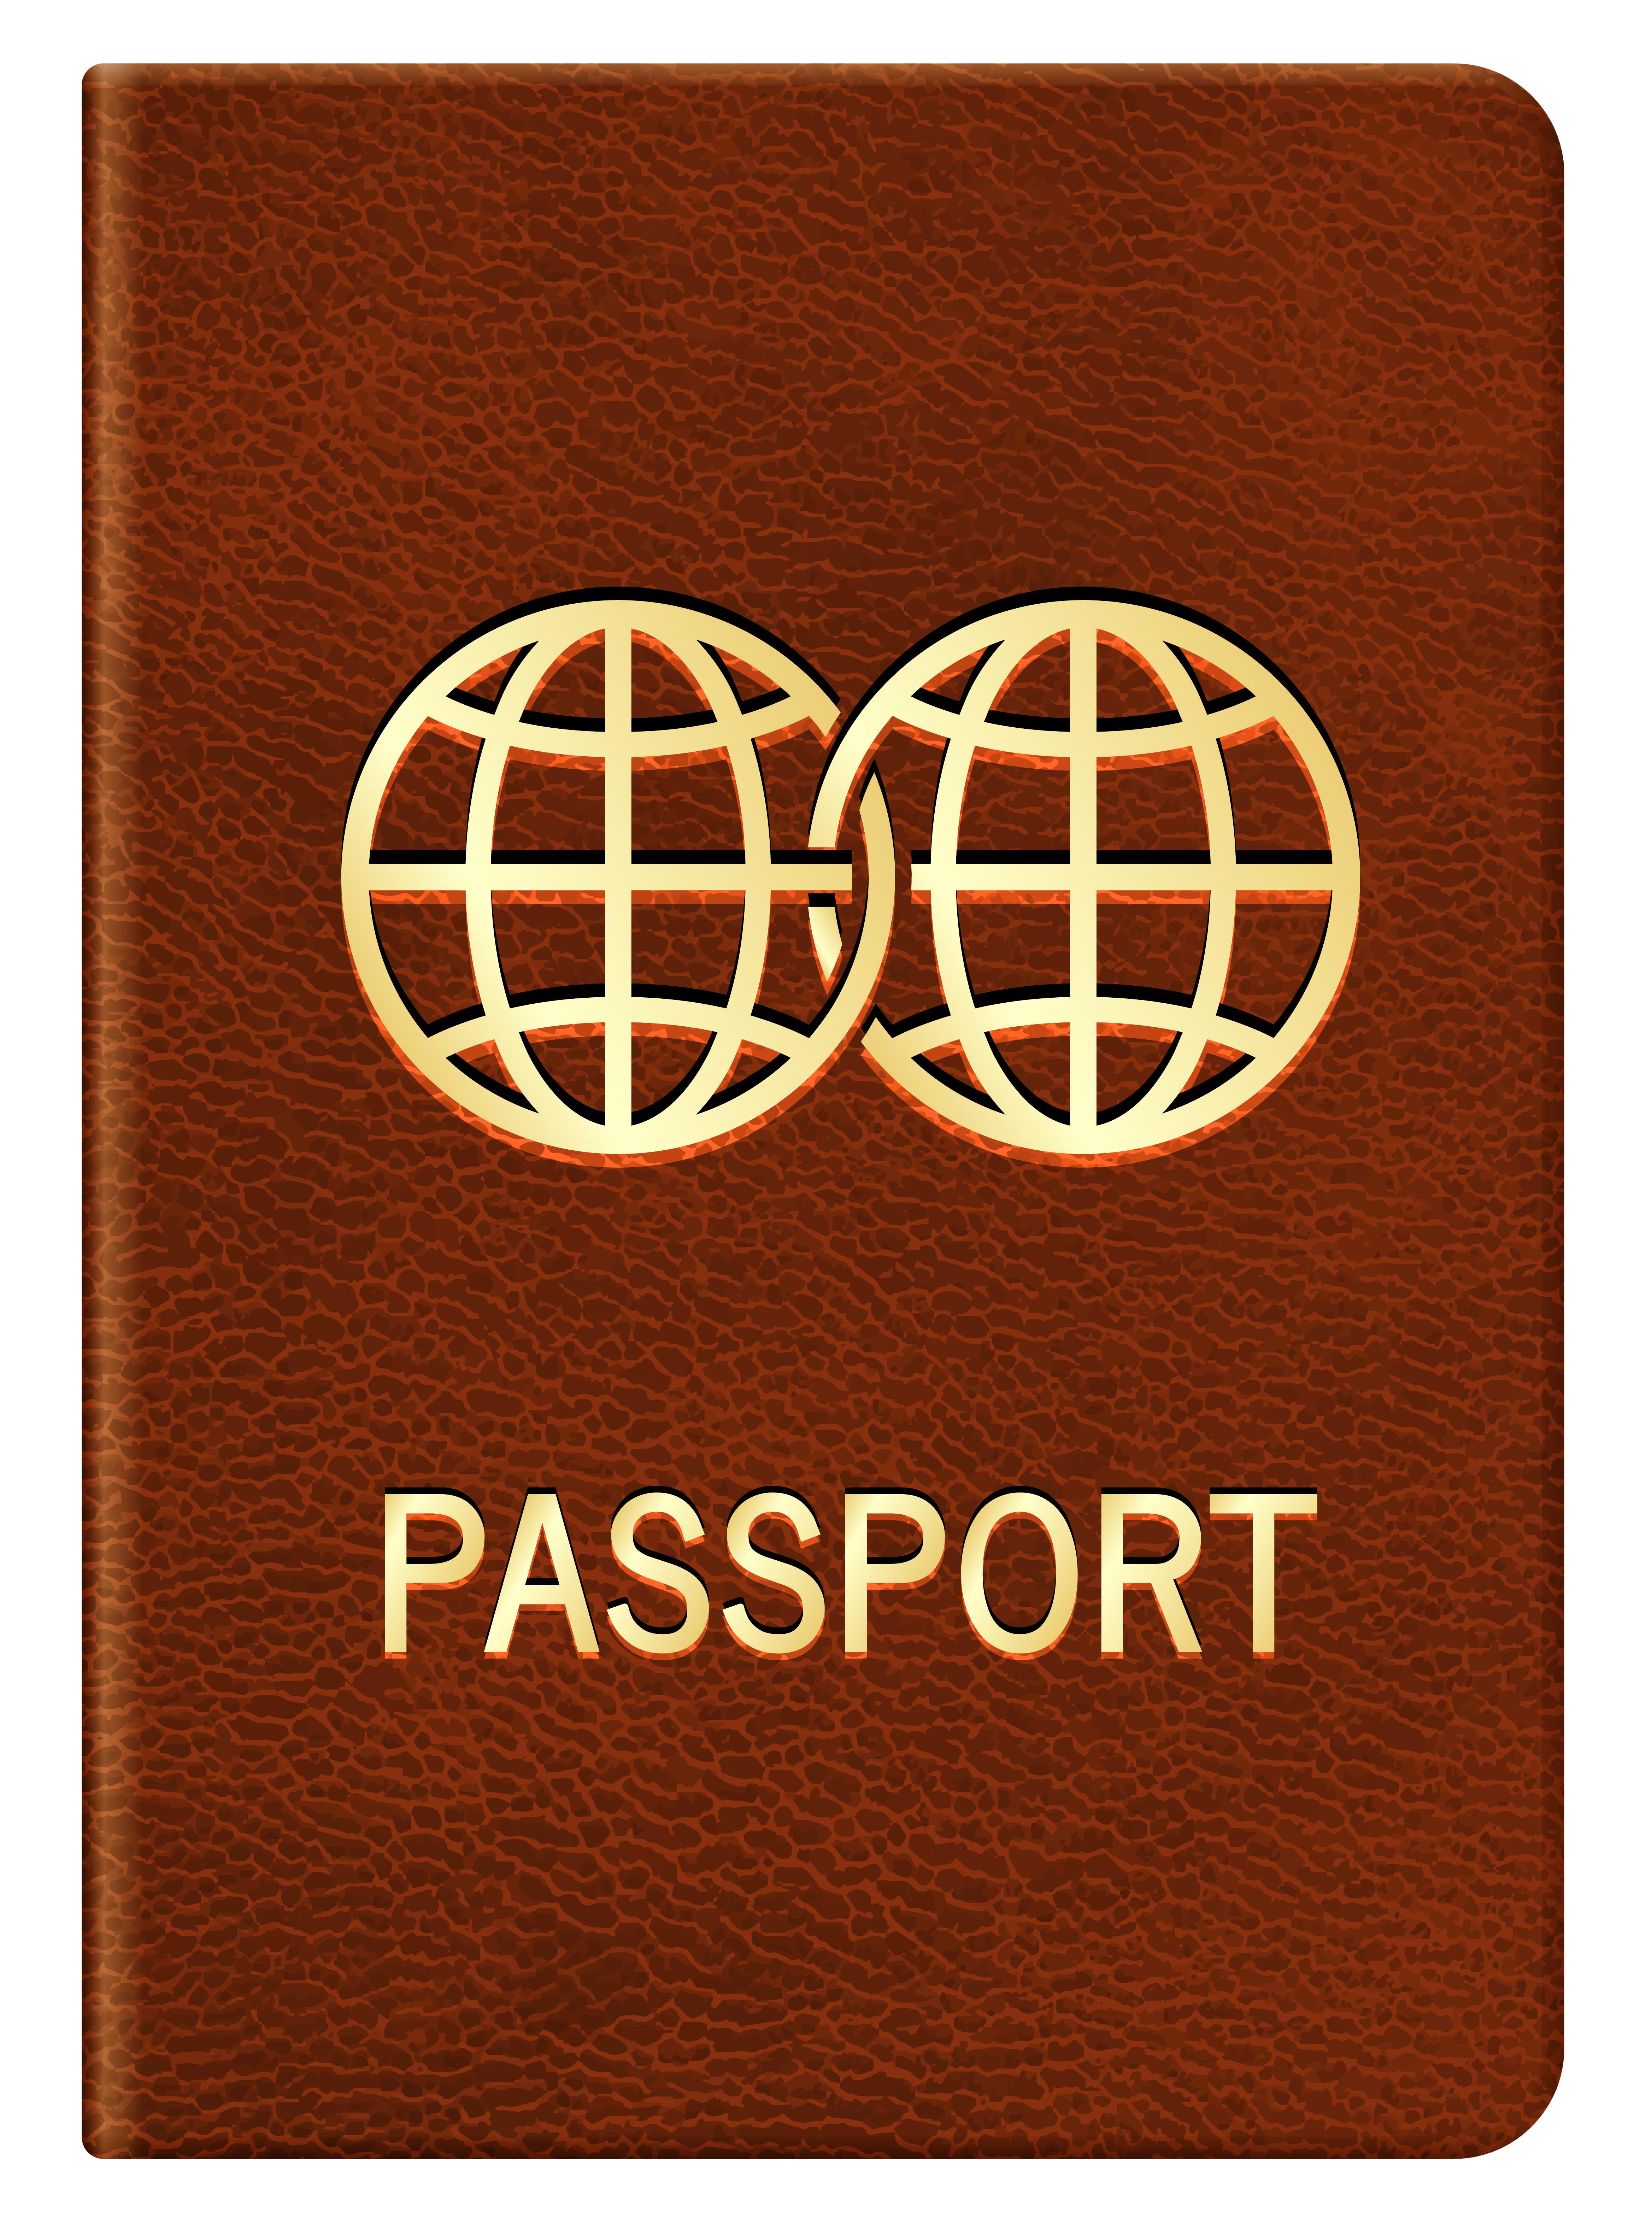 cartoon passport clipart - Clipground